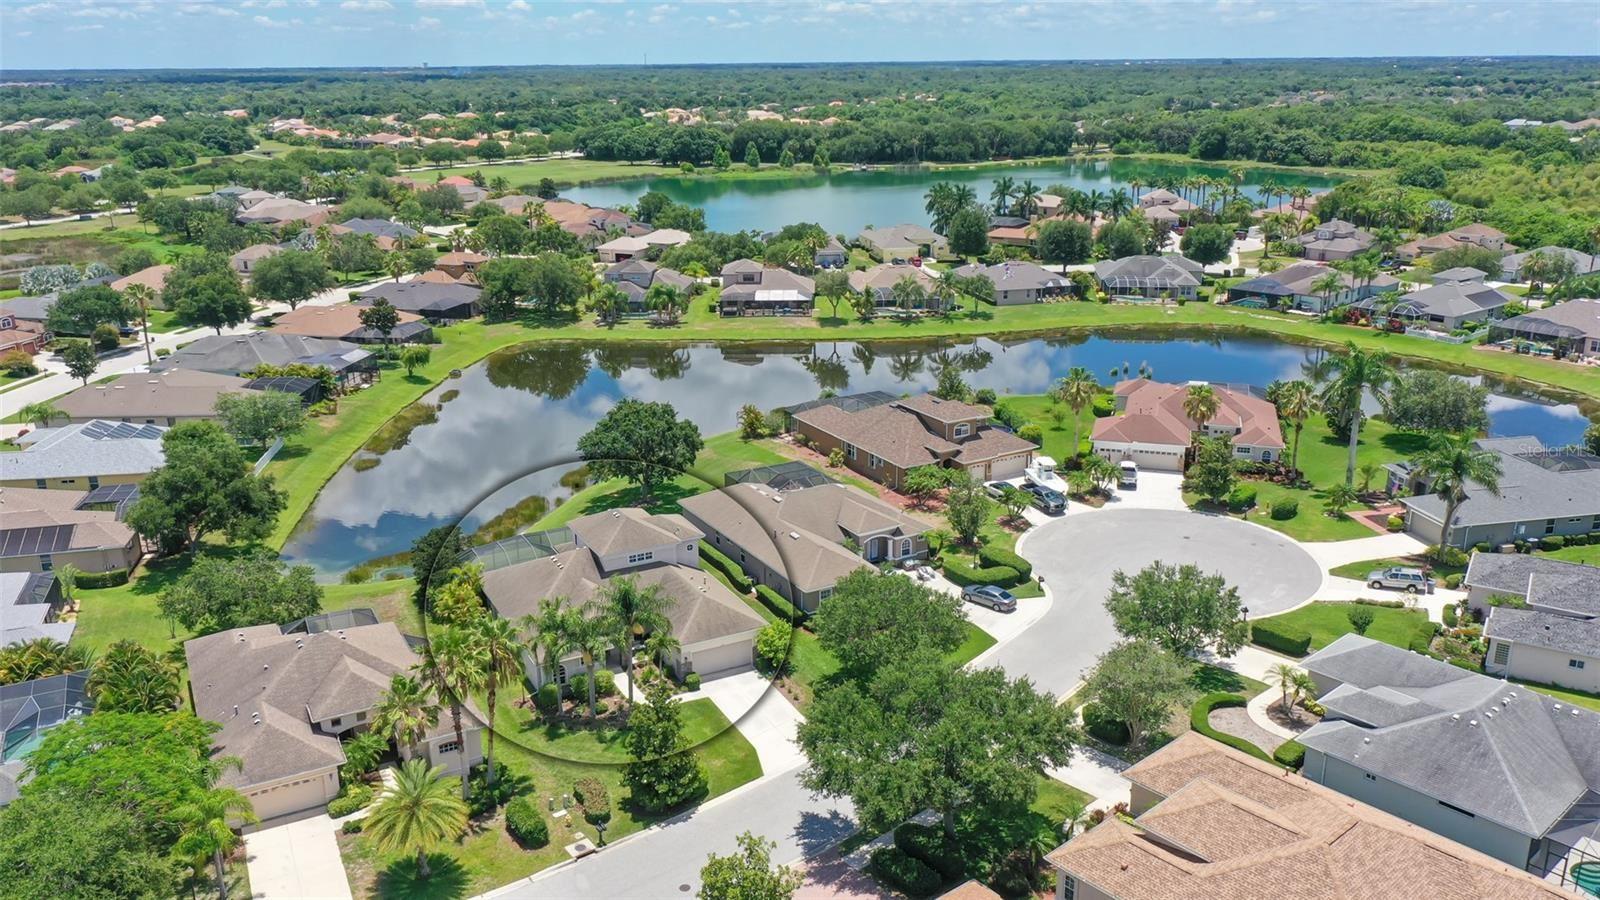 Photo of 315 SALVIA COURT, BRADENTON, FL 34212 (MLS # A4503623)